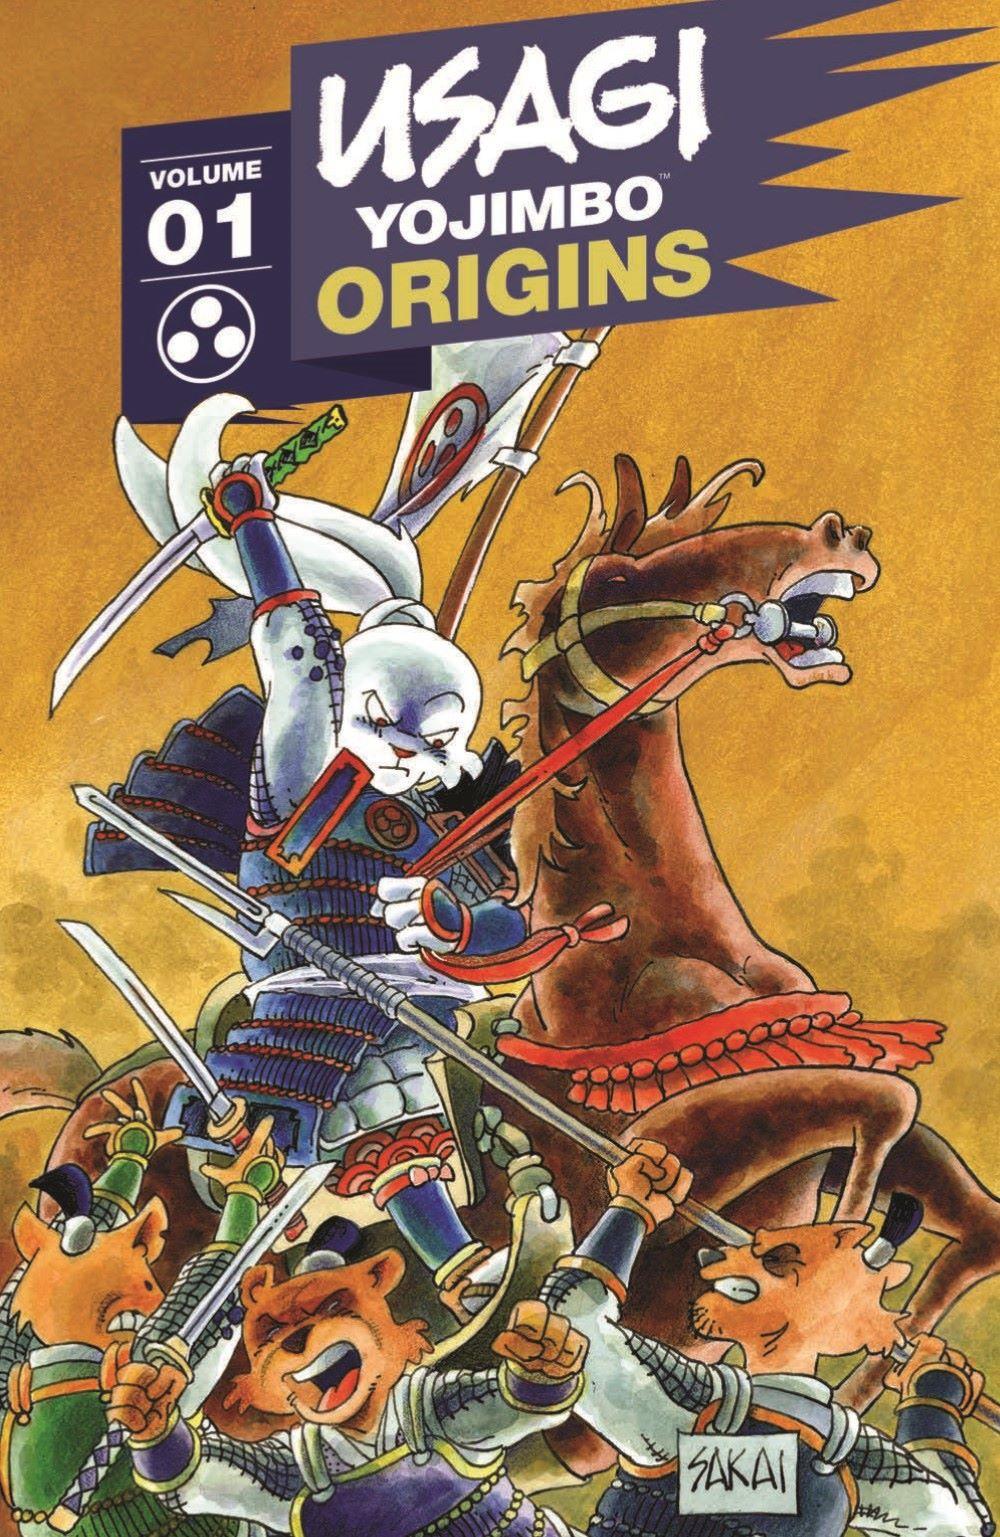 Usagi-Origins-v01-pr-1 ComicList Previews: USAGI YOJIMBO ORIGINS VOLUME 1 SAMURAI TP